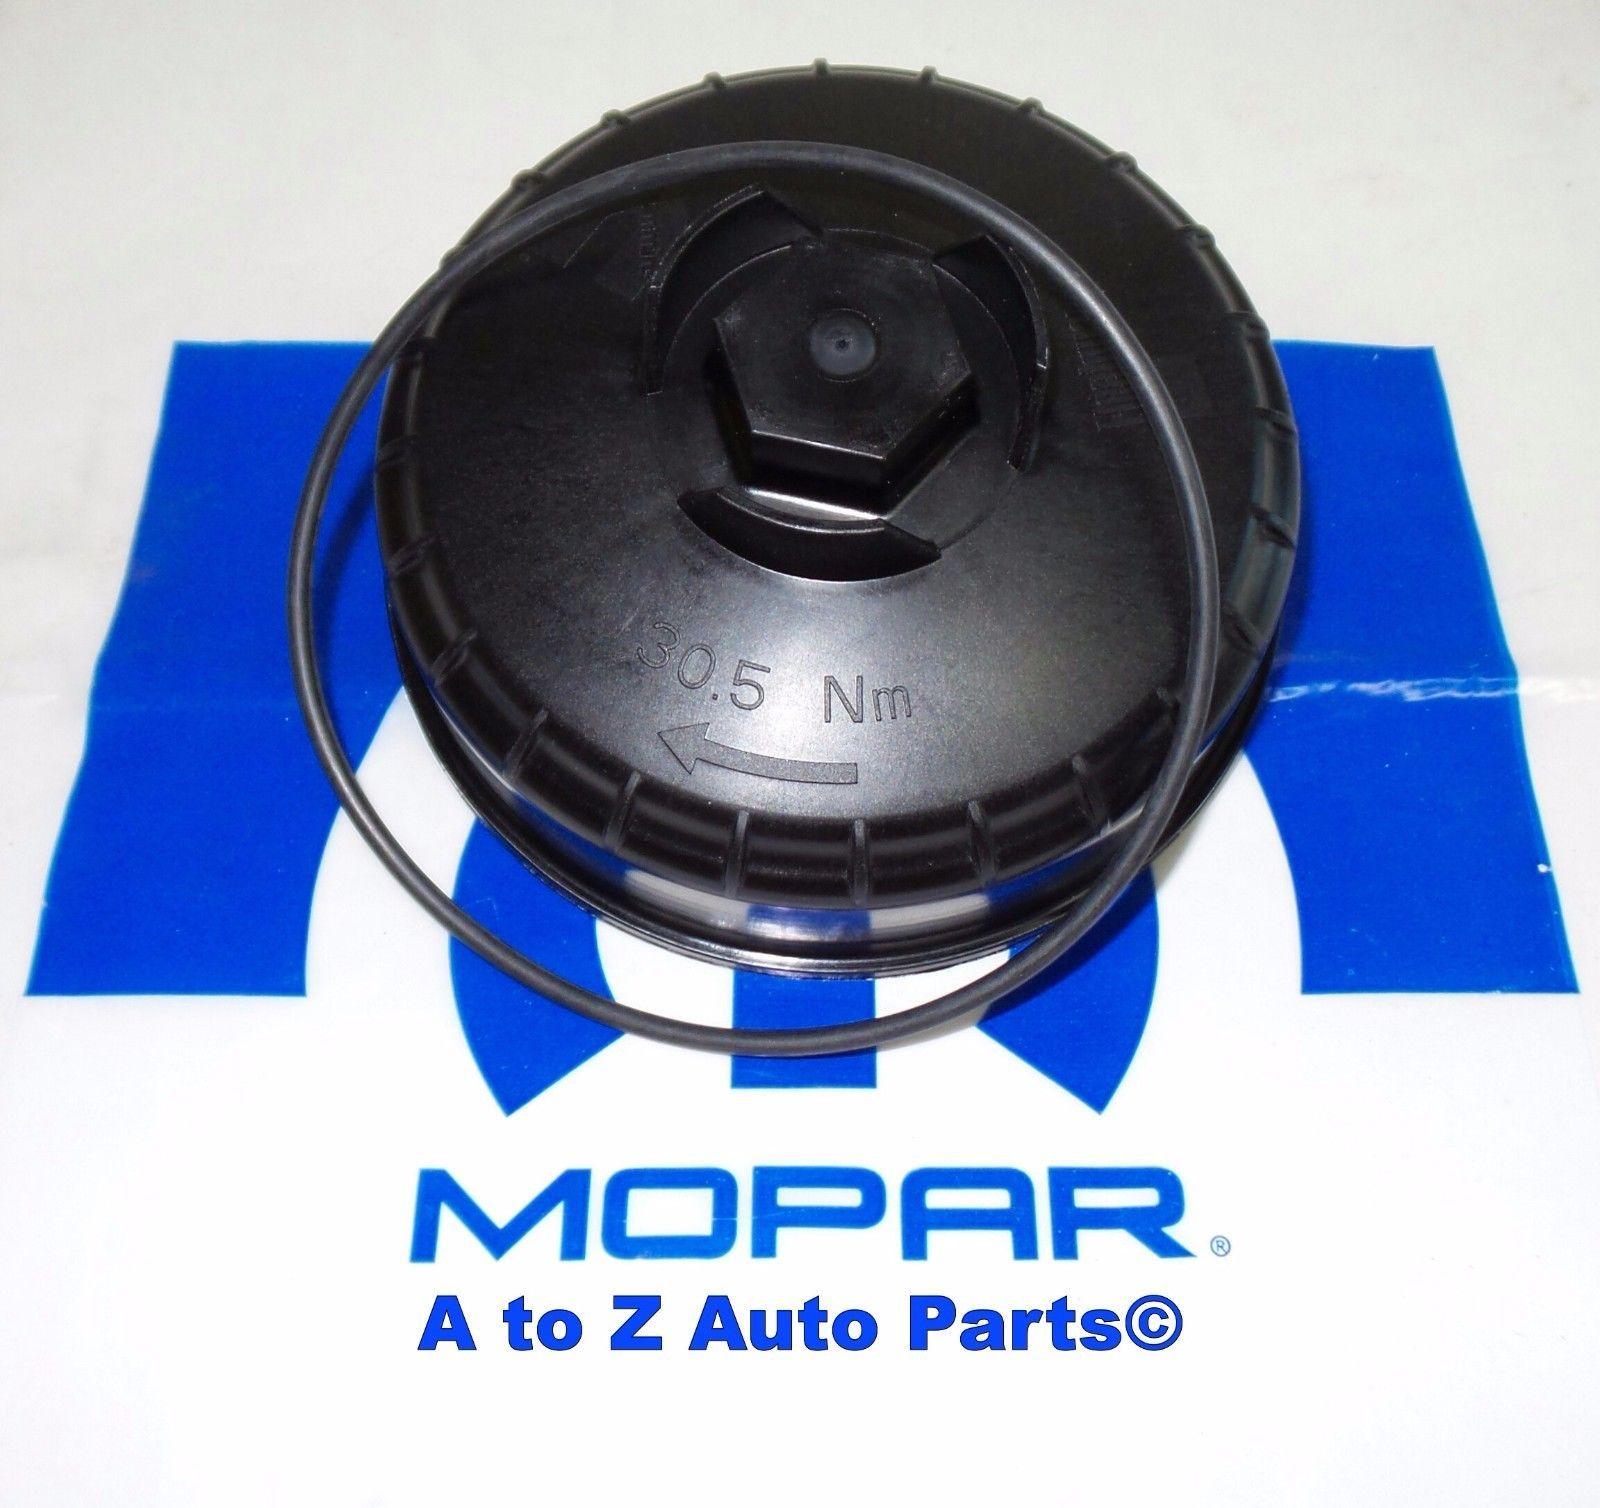 New Dodge Ram 67 Cummins Diesel Fuel Filter And 13 Similar Items Mopar S L1600